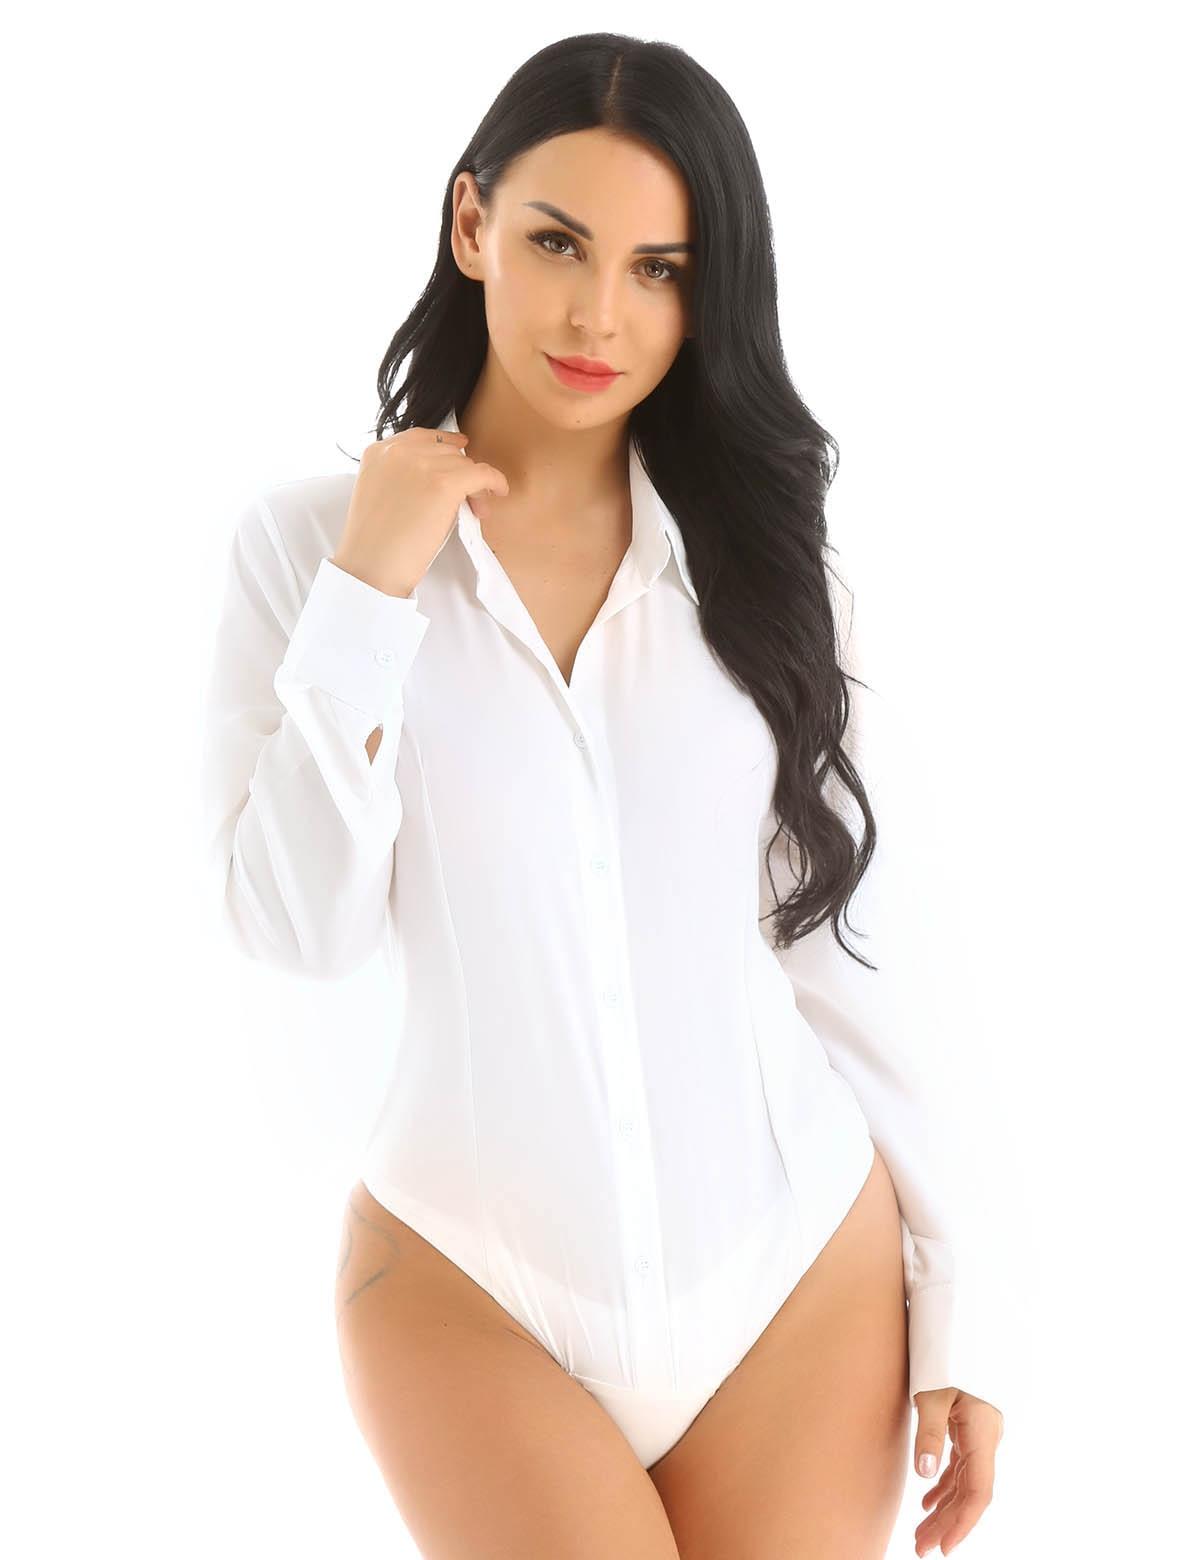 Office Lady Work White Bodysuit Woman Long Sleeve OL Shirt Bodysuit Women's  Clothing Lady Turn Down Collar Tops Body Blouse Suit Bodysuits  - AliExpress